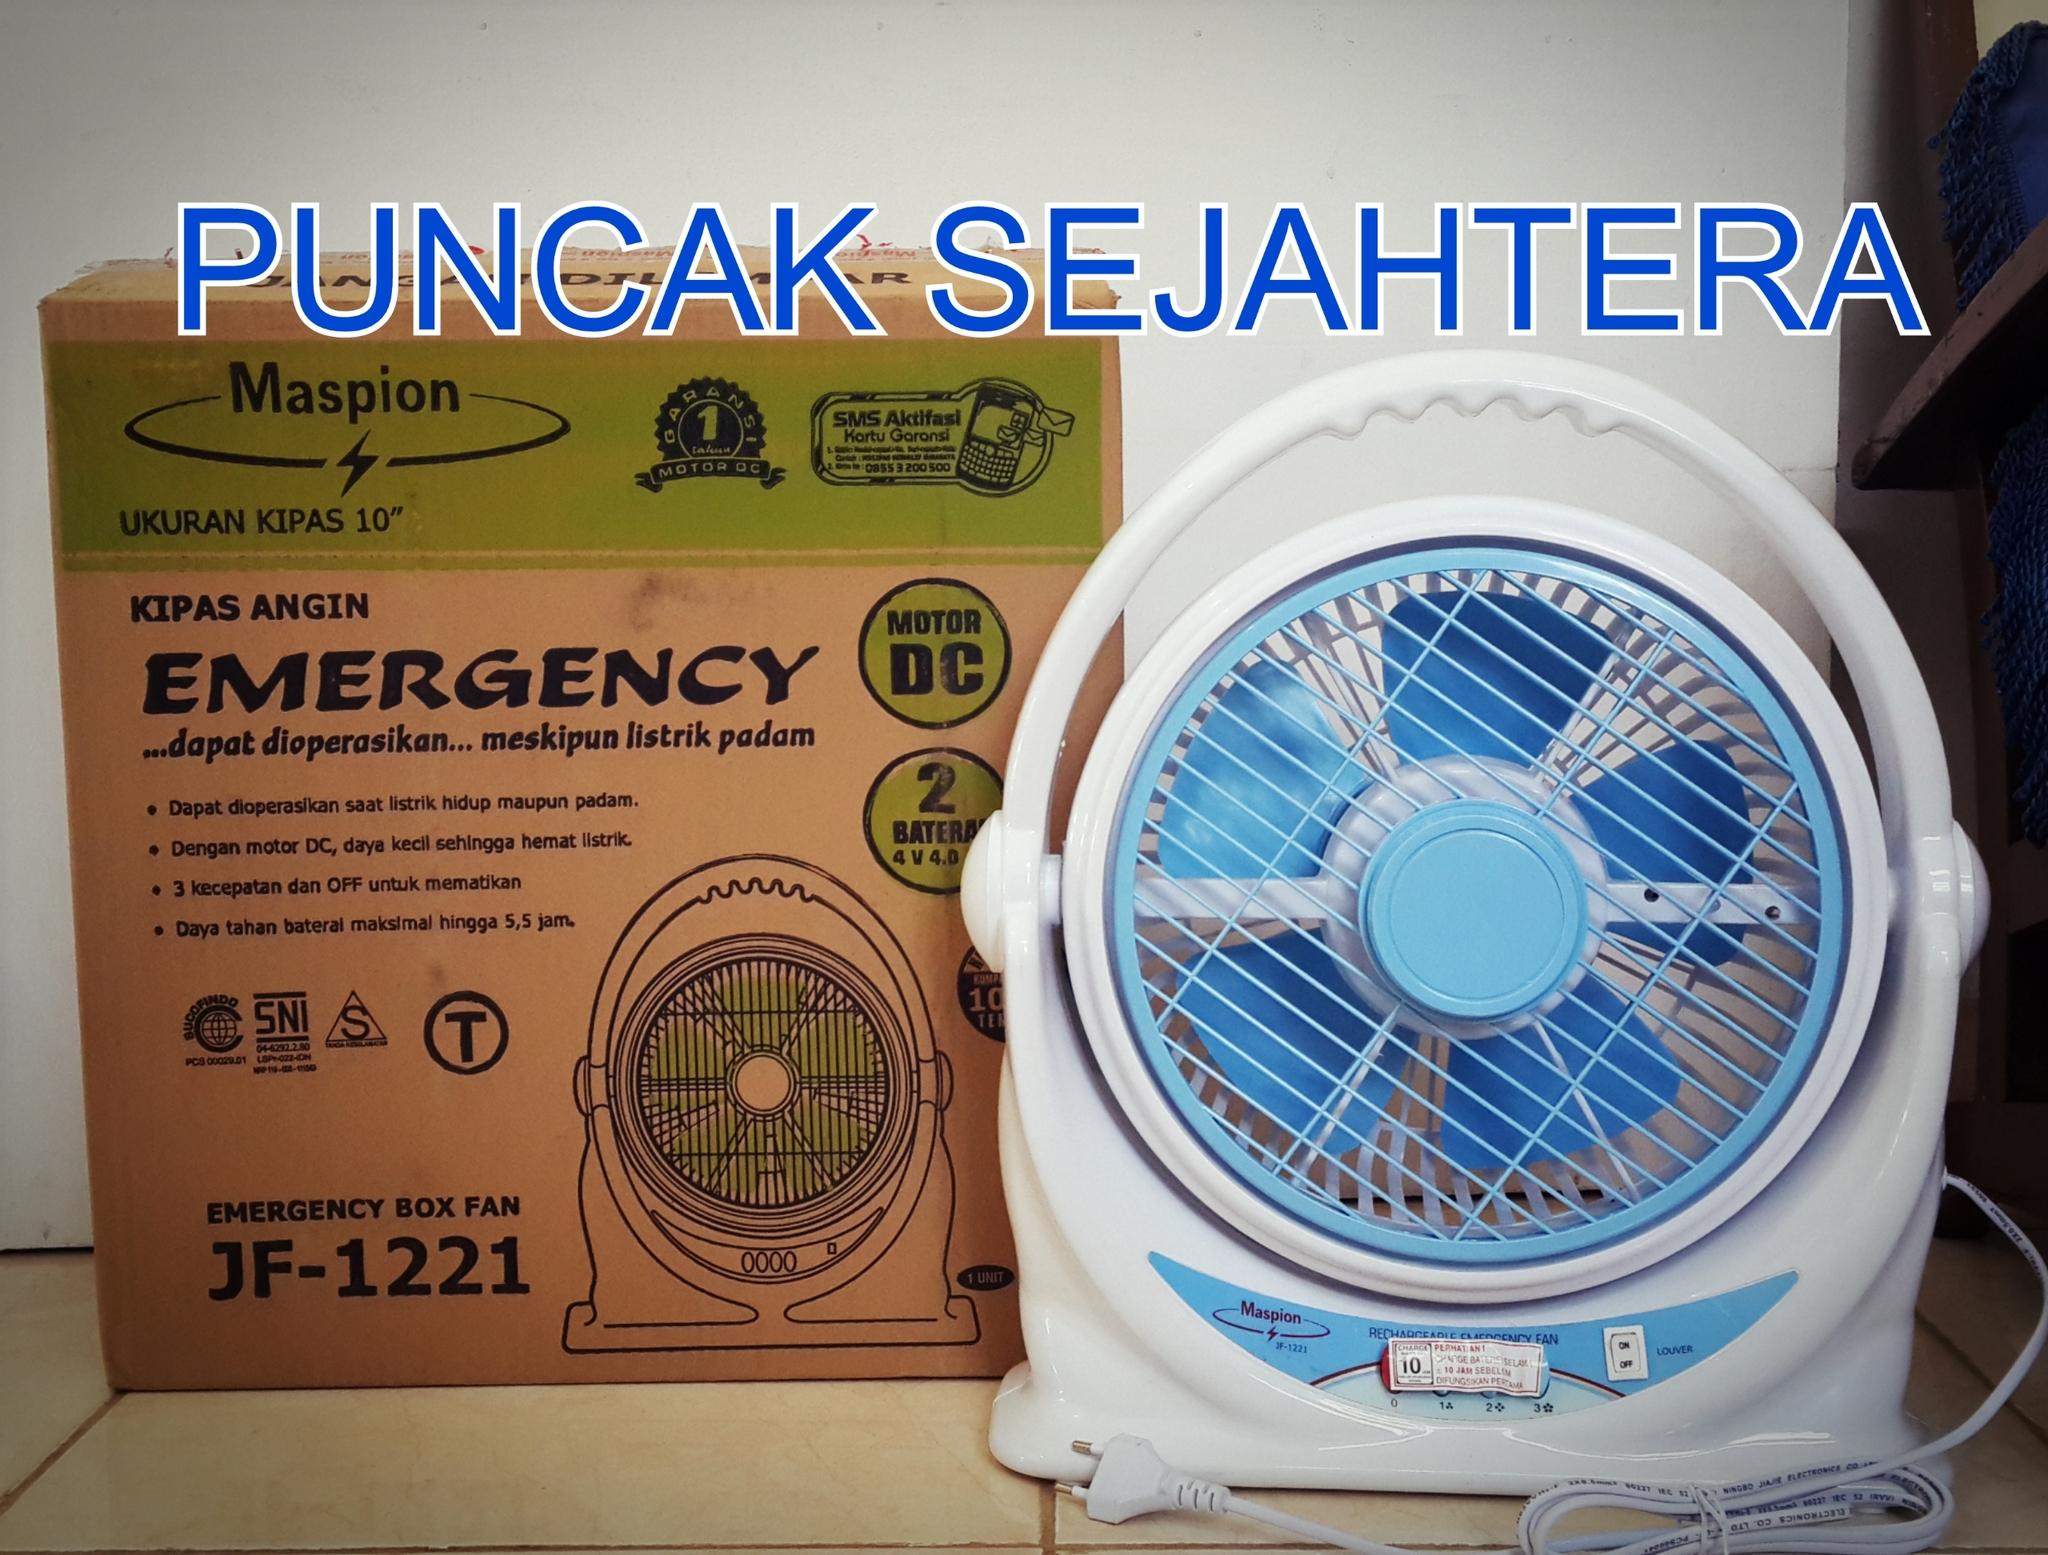 harga Kipas Emergency cas ulang Maspion Box Fan JF-1221 (Garansi 1 thn) Tokopedia.com